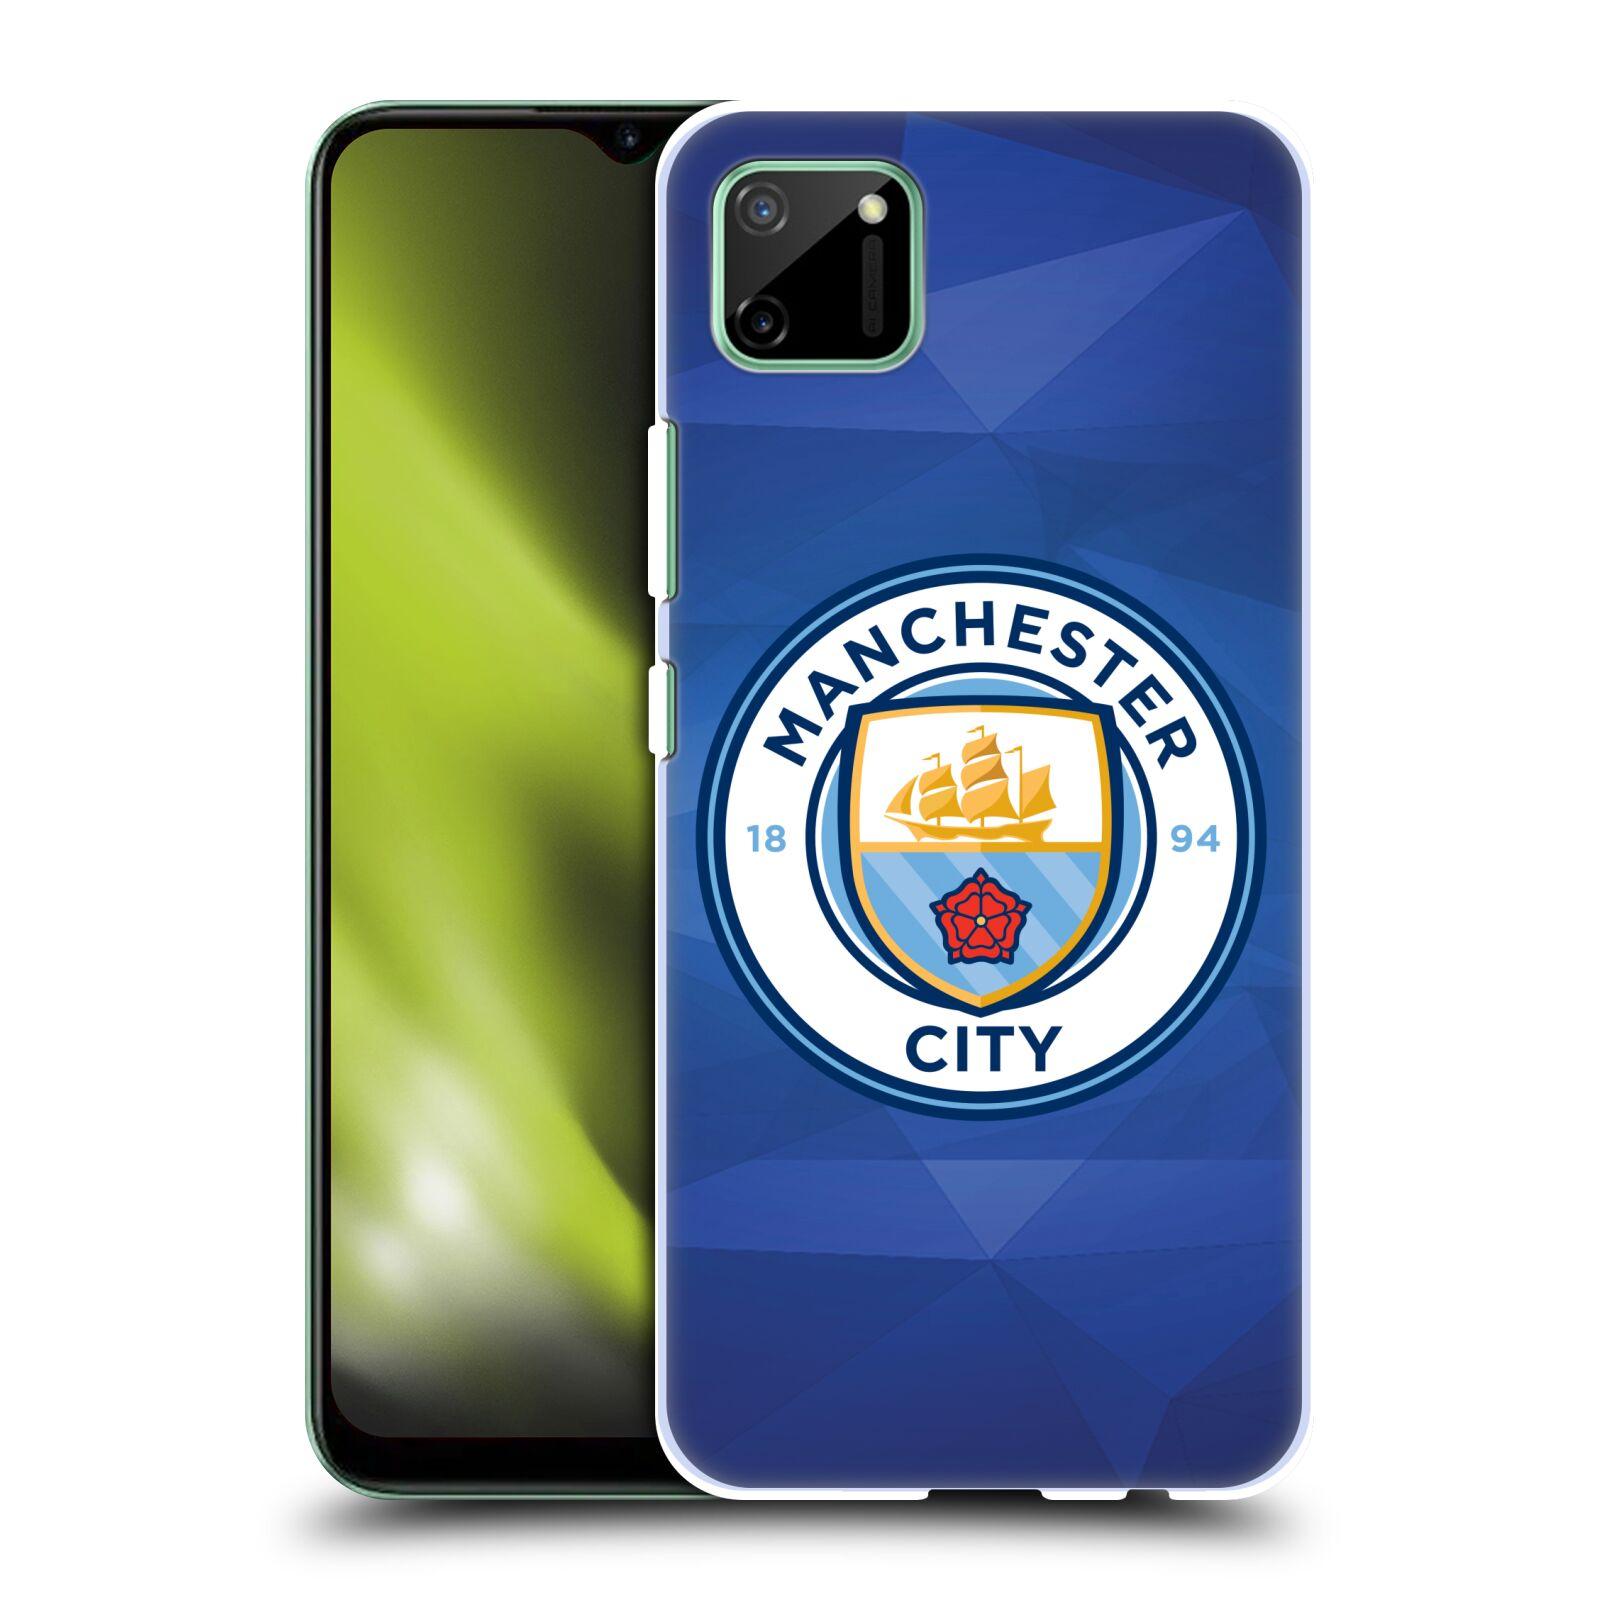 Plastové pouzdro na mobil Realme C11 - Head Case - Manchester City FC - Modré nové logo